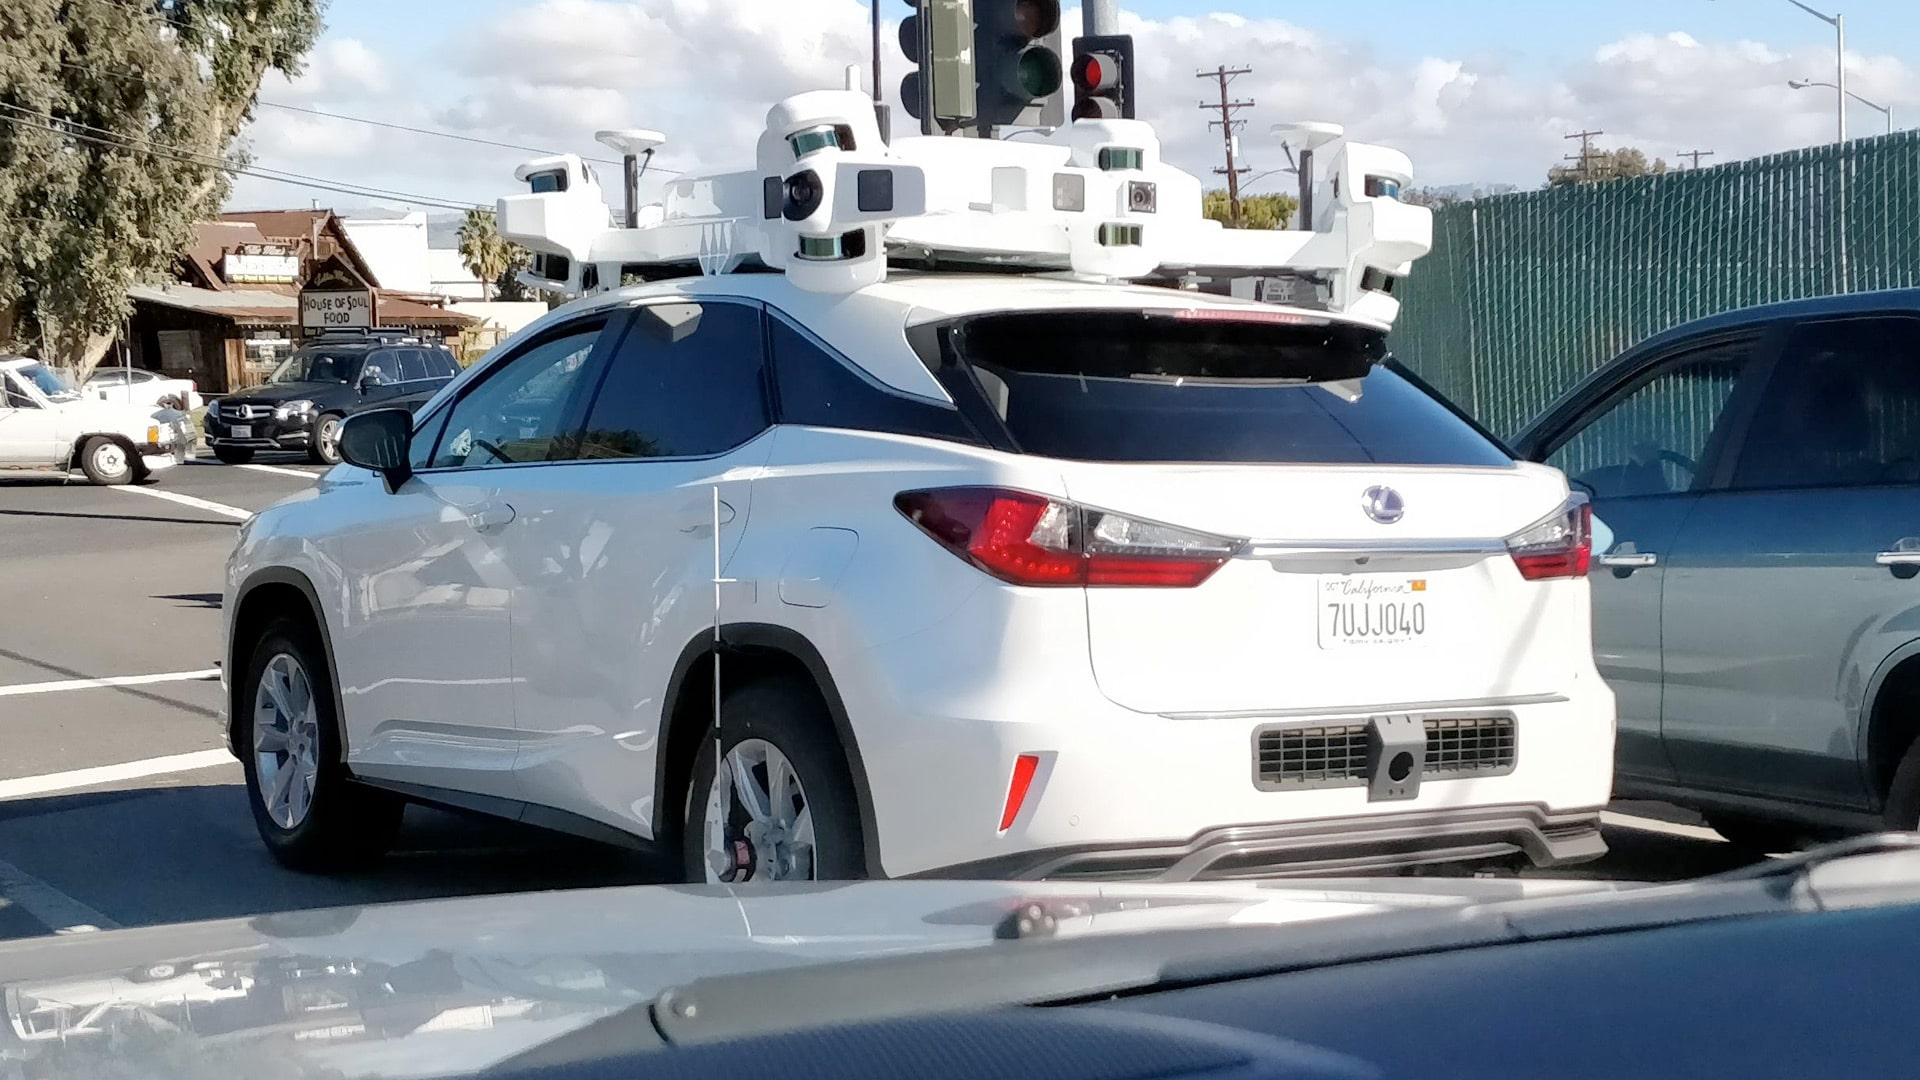 Veículos autônomo da Apple